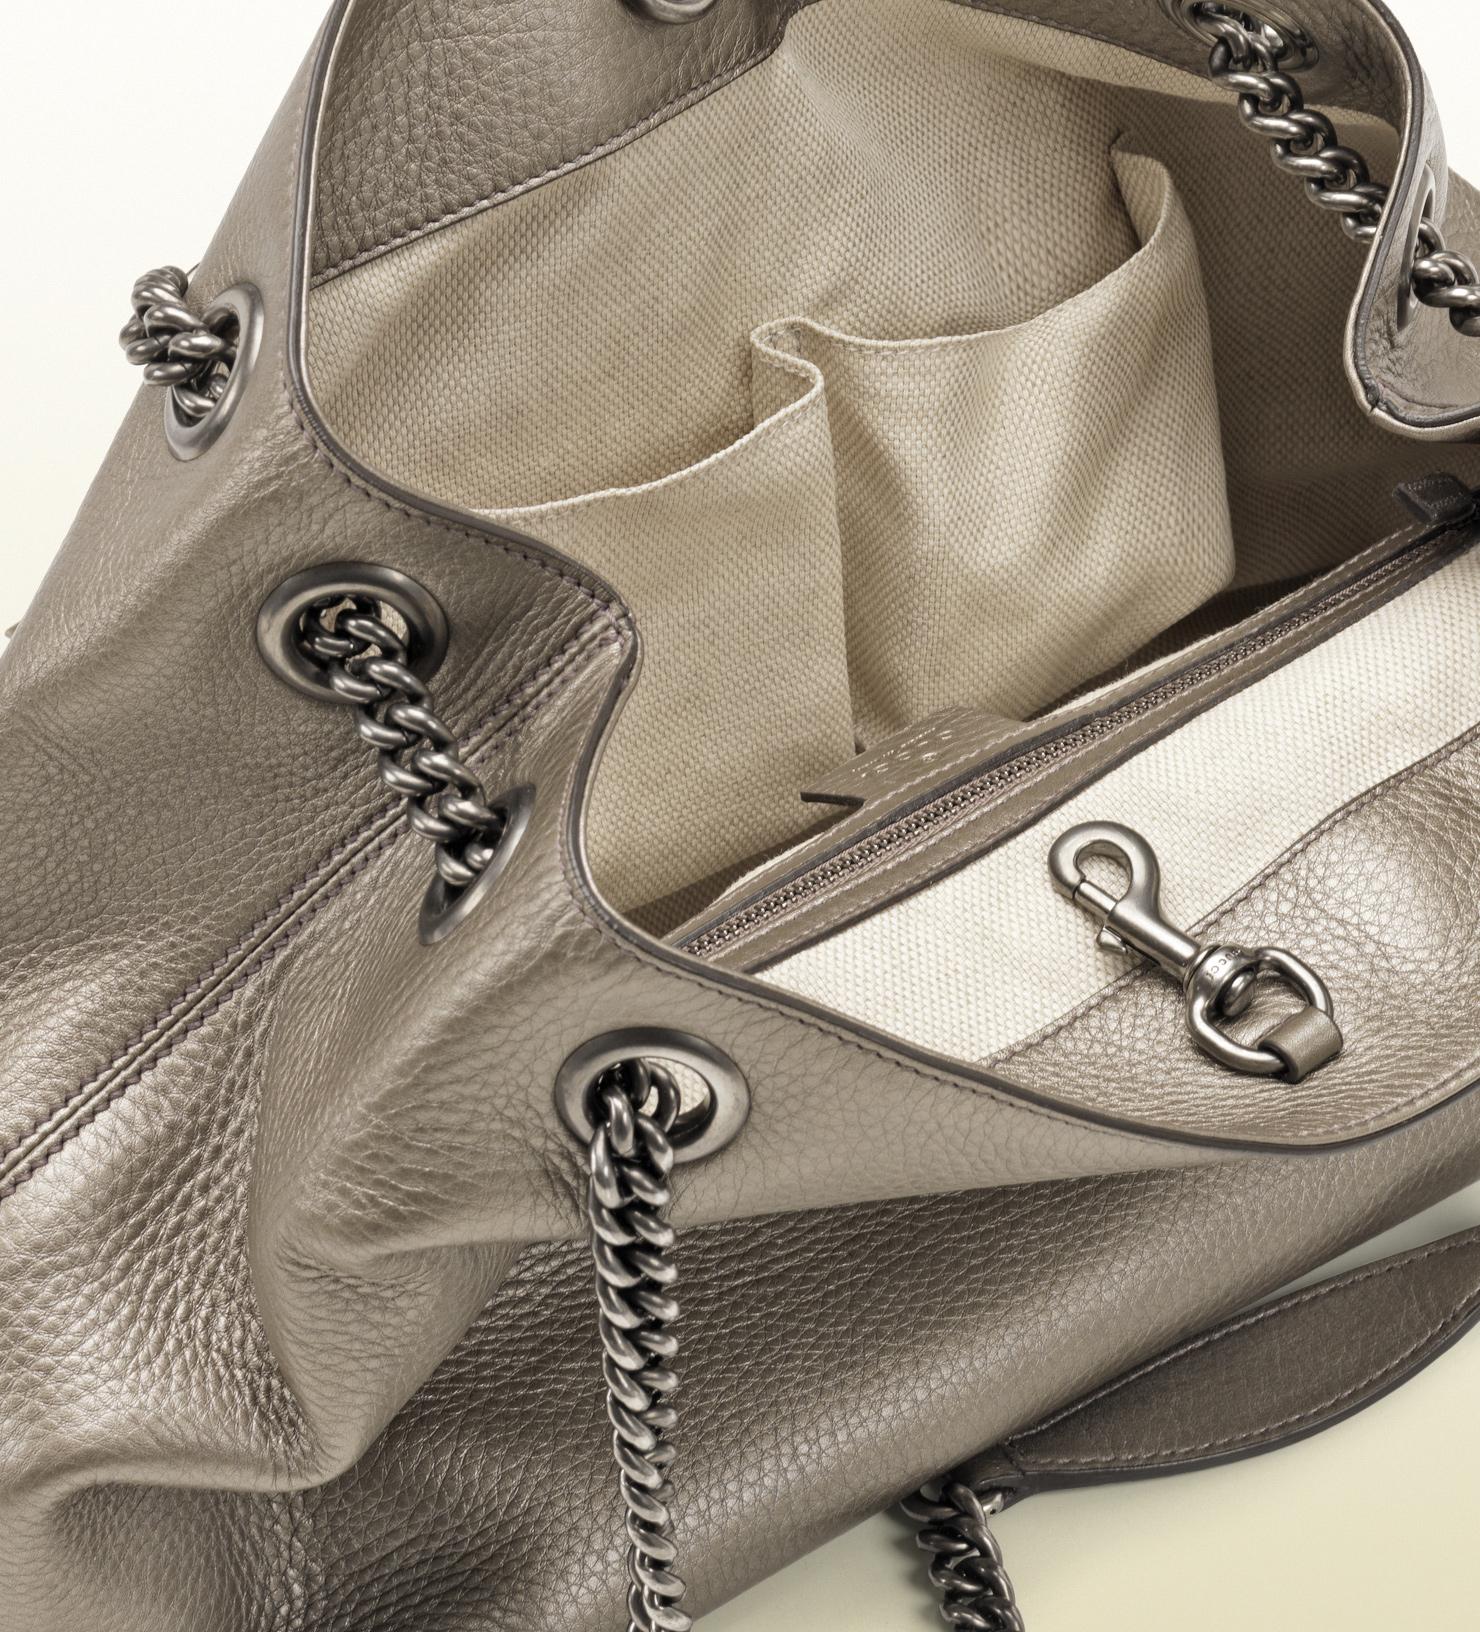 9245b279ee27 Innovatenortheastflorida.com Lyst Gucci Soho Metallic Leather ...